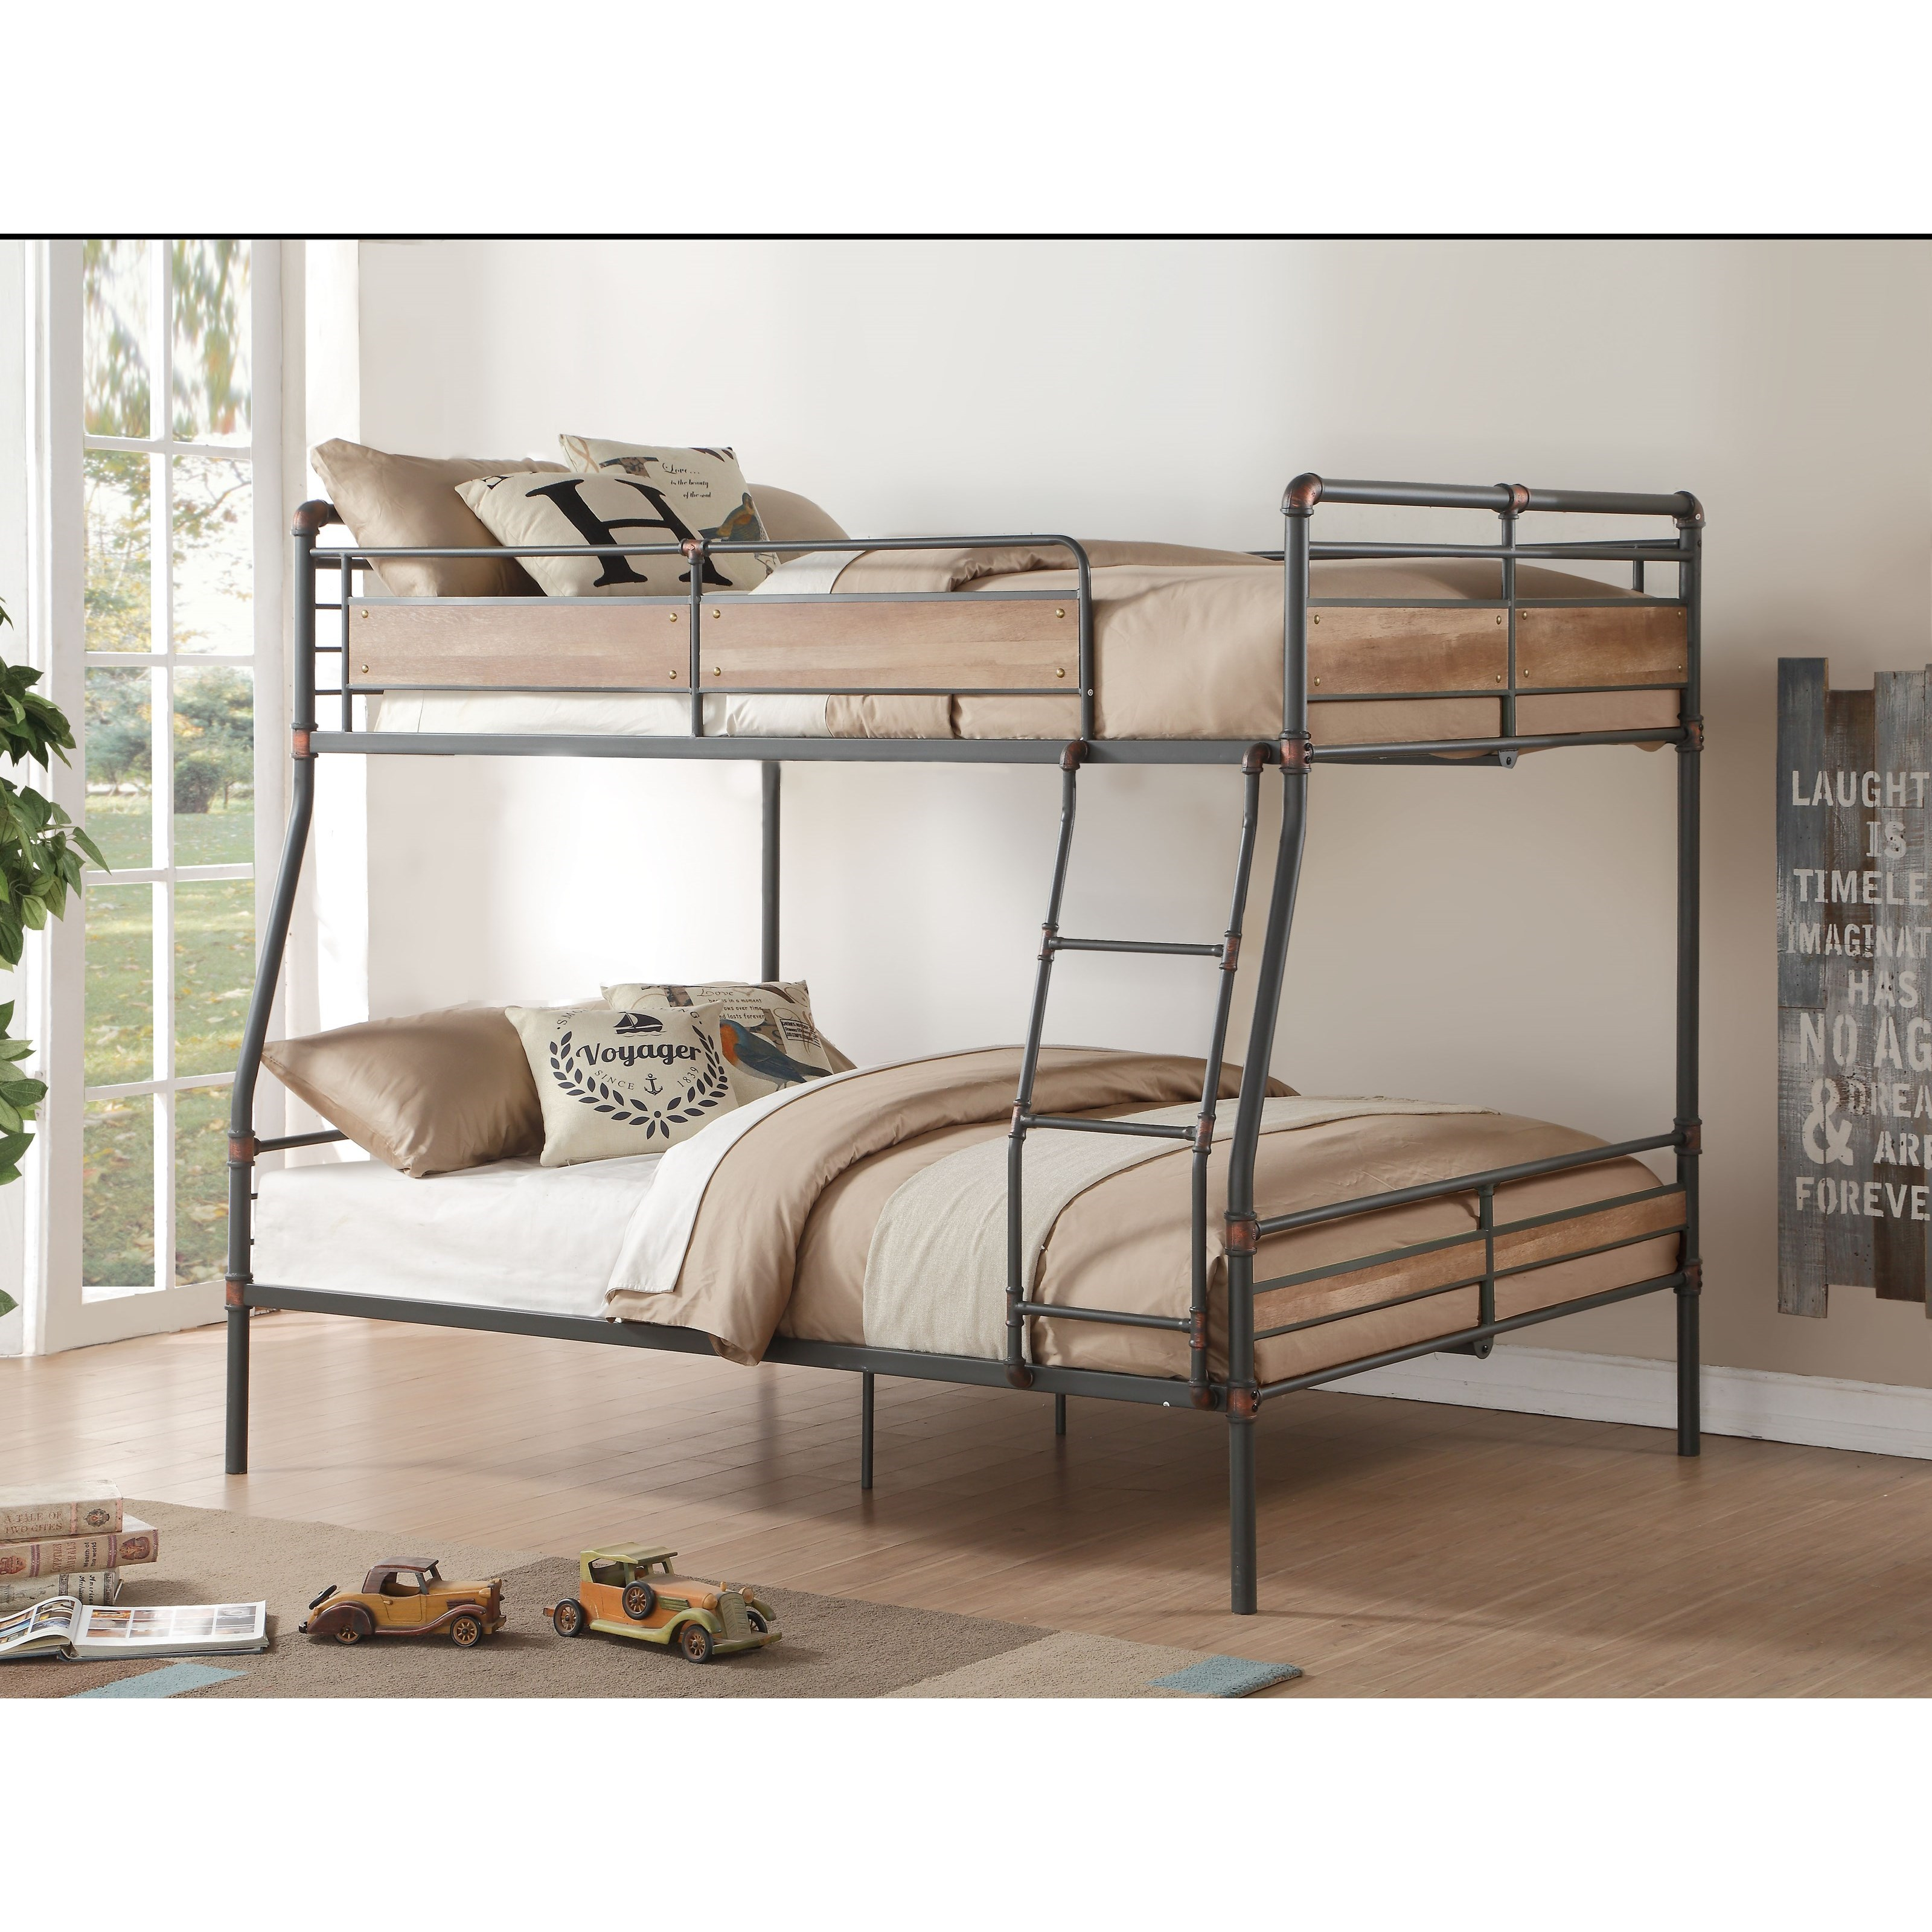 Picture of: Acme Furniture Brantley Ii Industrial Full Xl Over Queen Bunk Bed Dream Home Interiors Bunk Beds